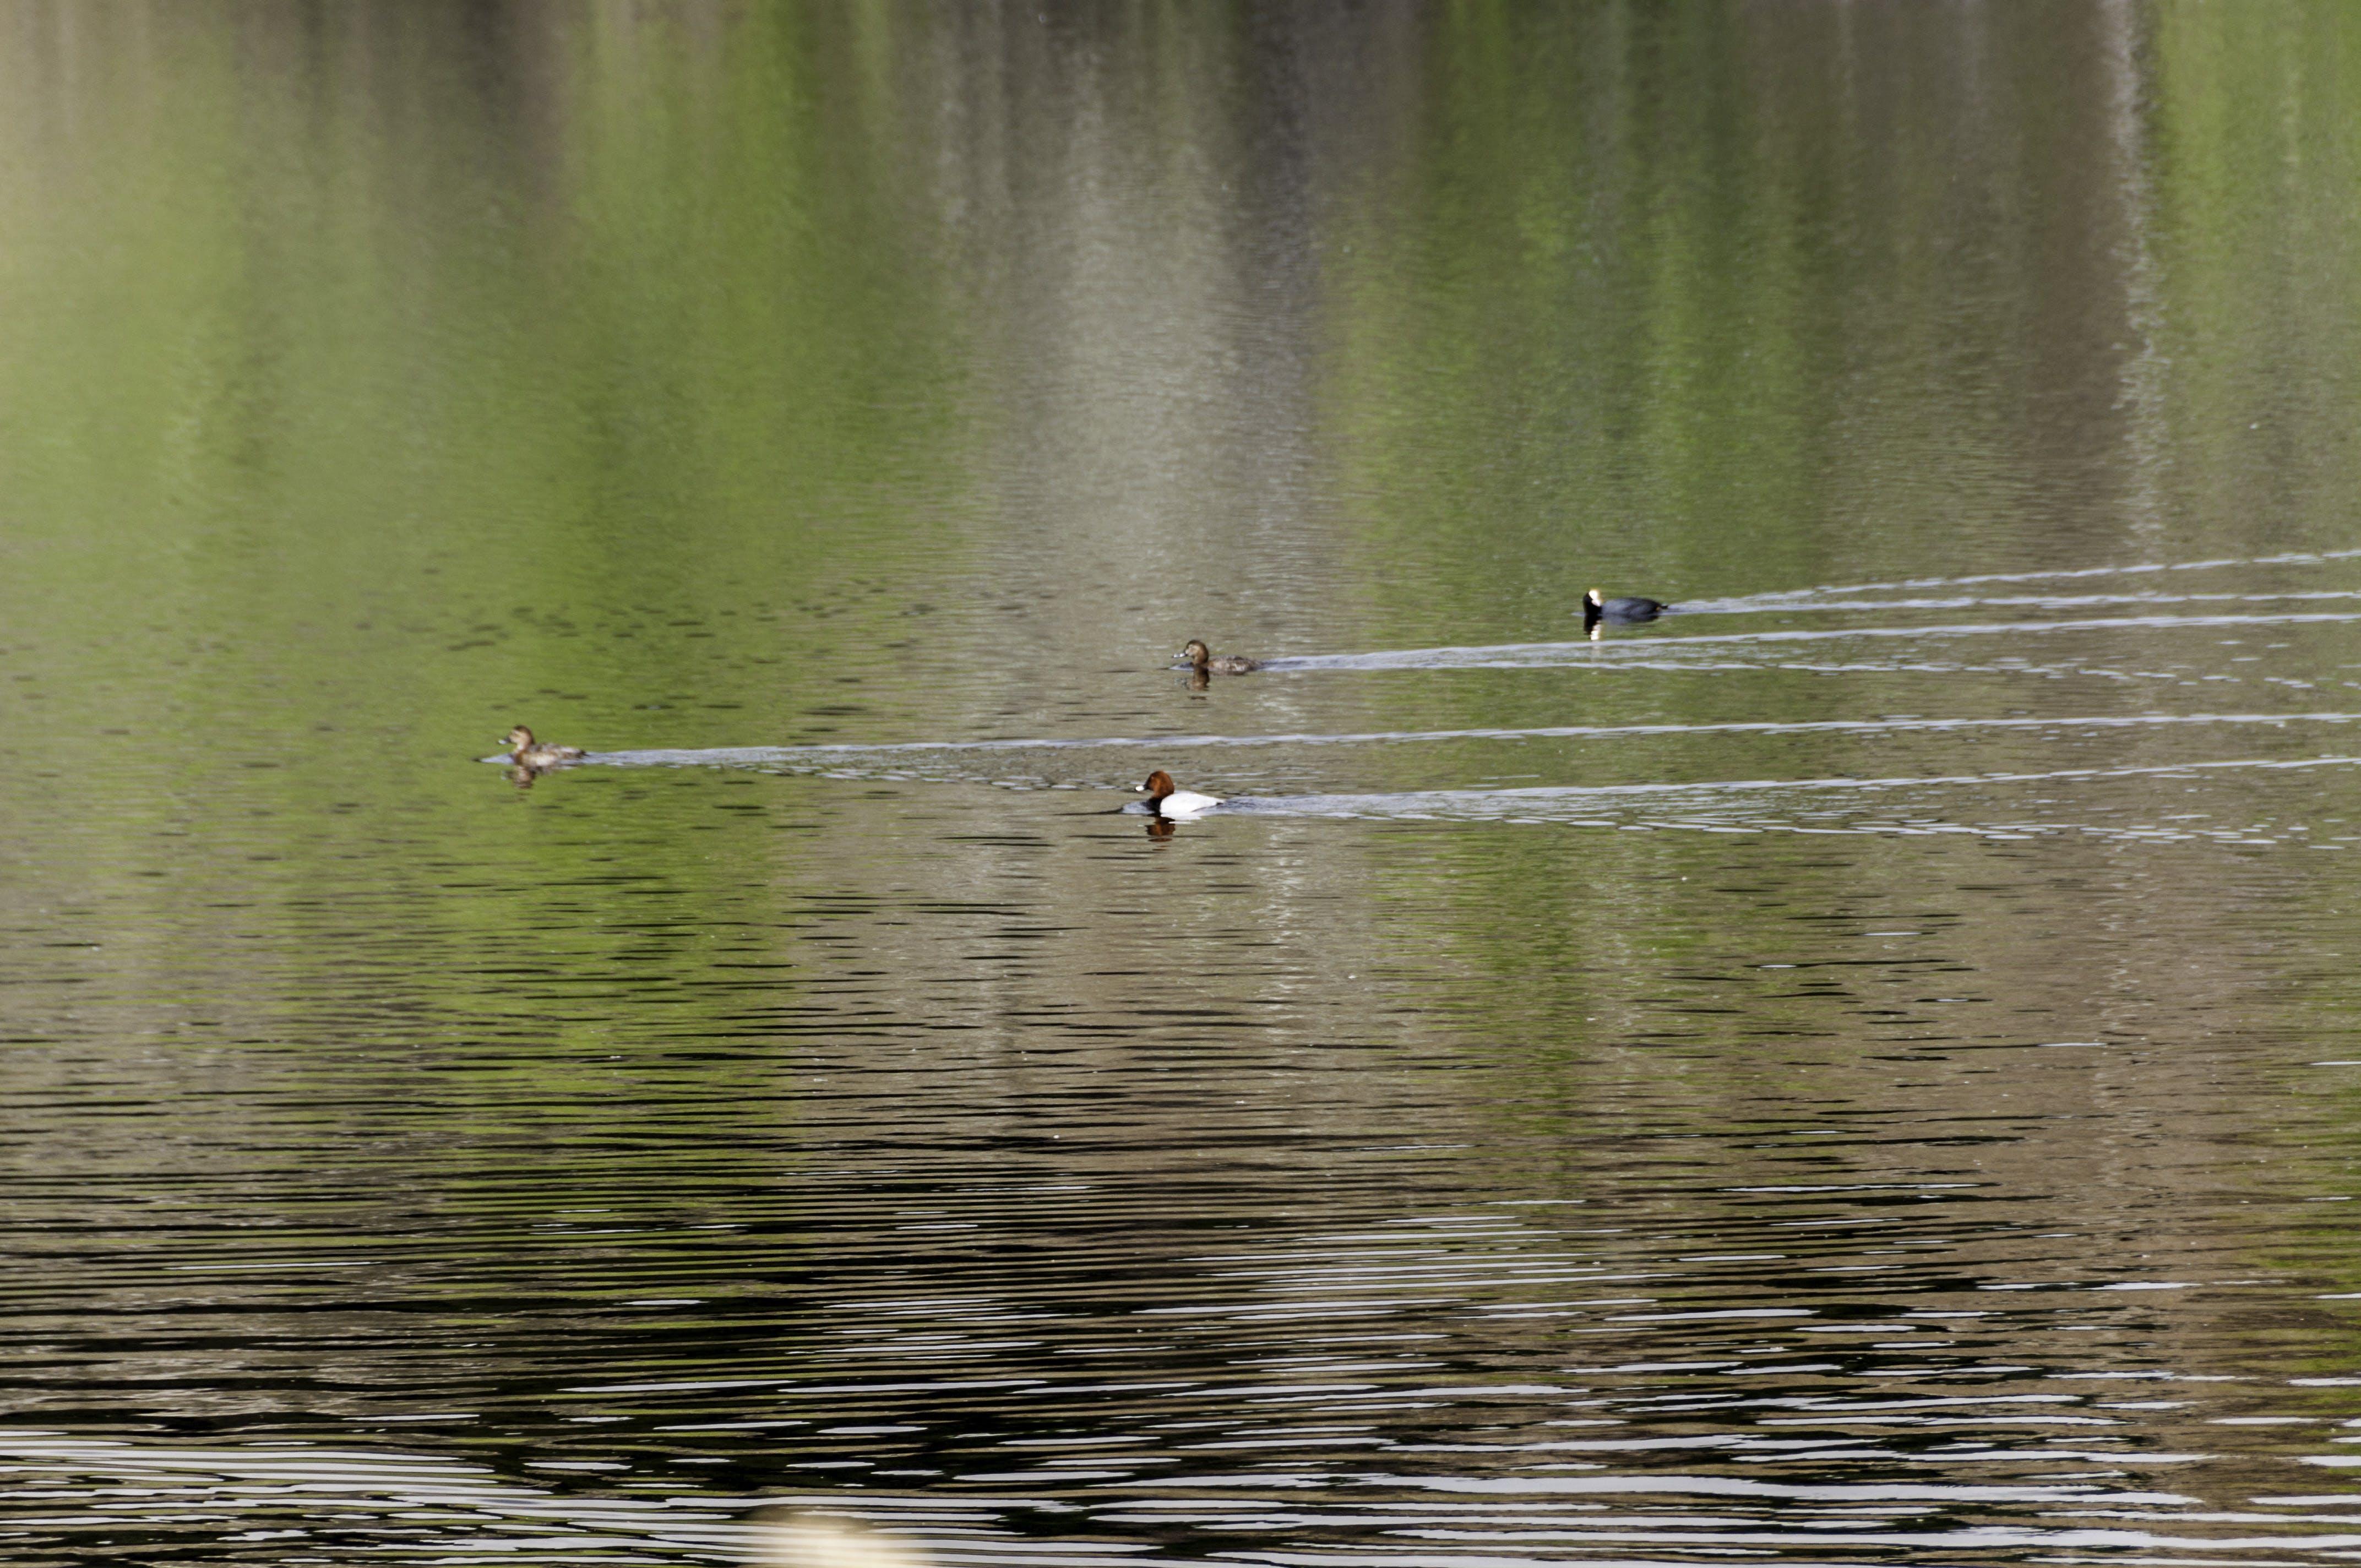 Free stock photo of duck bath